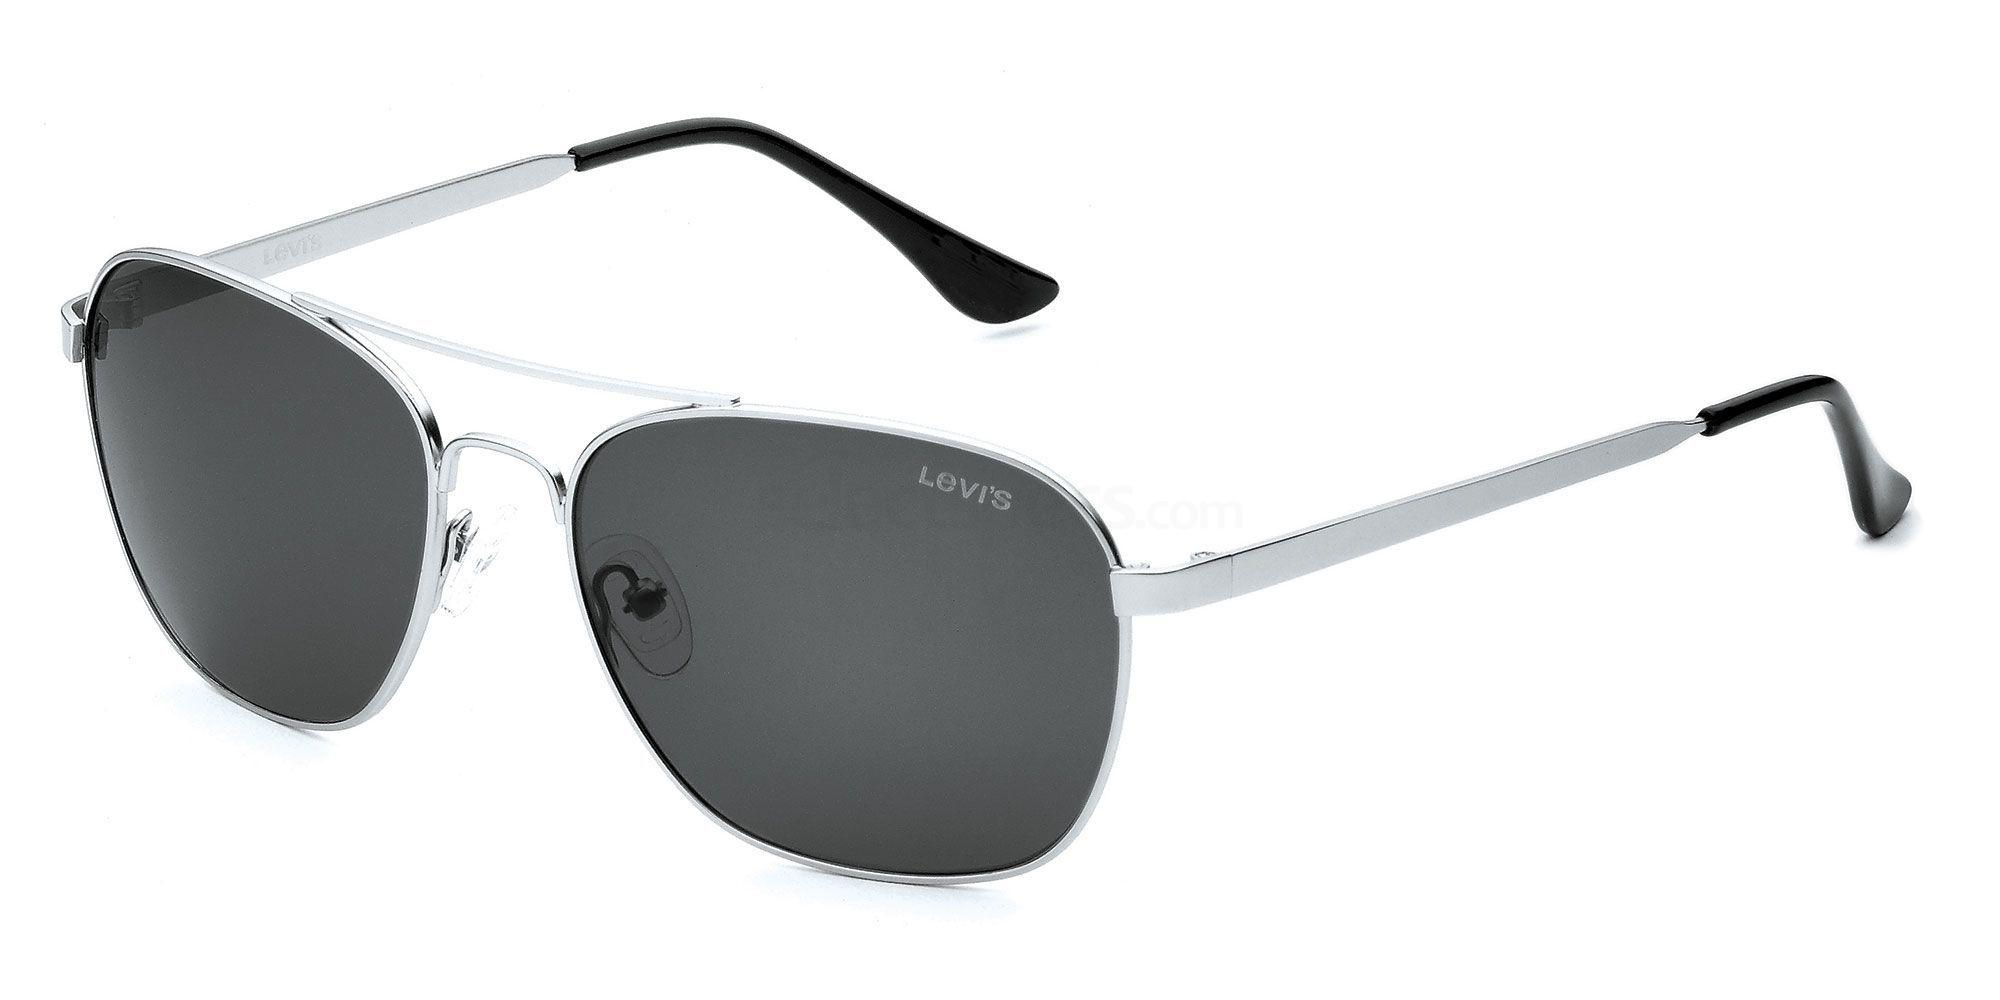 LO22369/01 LO22369 Sunglasses, Levi's Eyewear